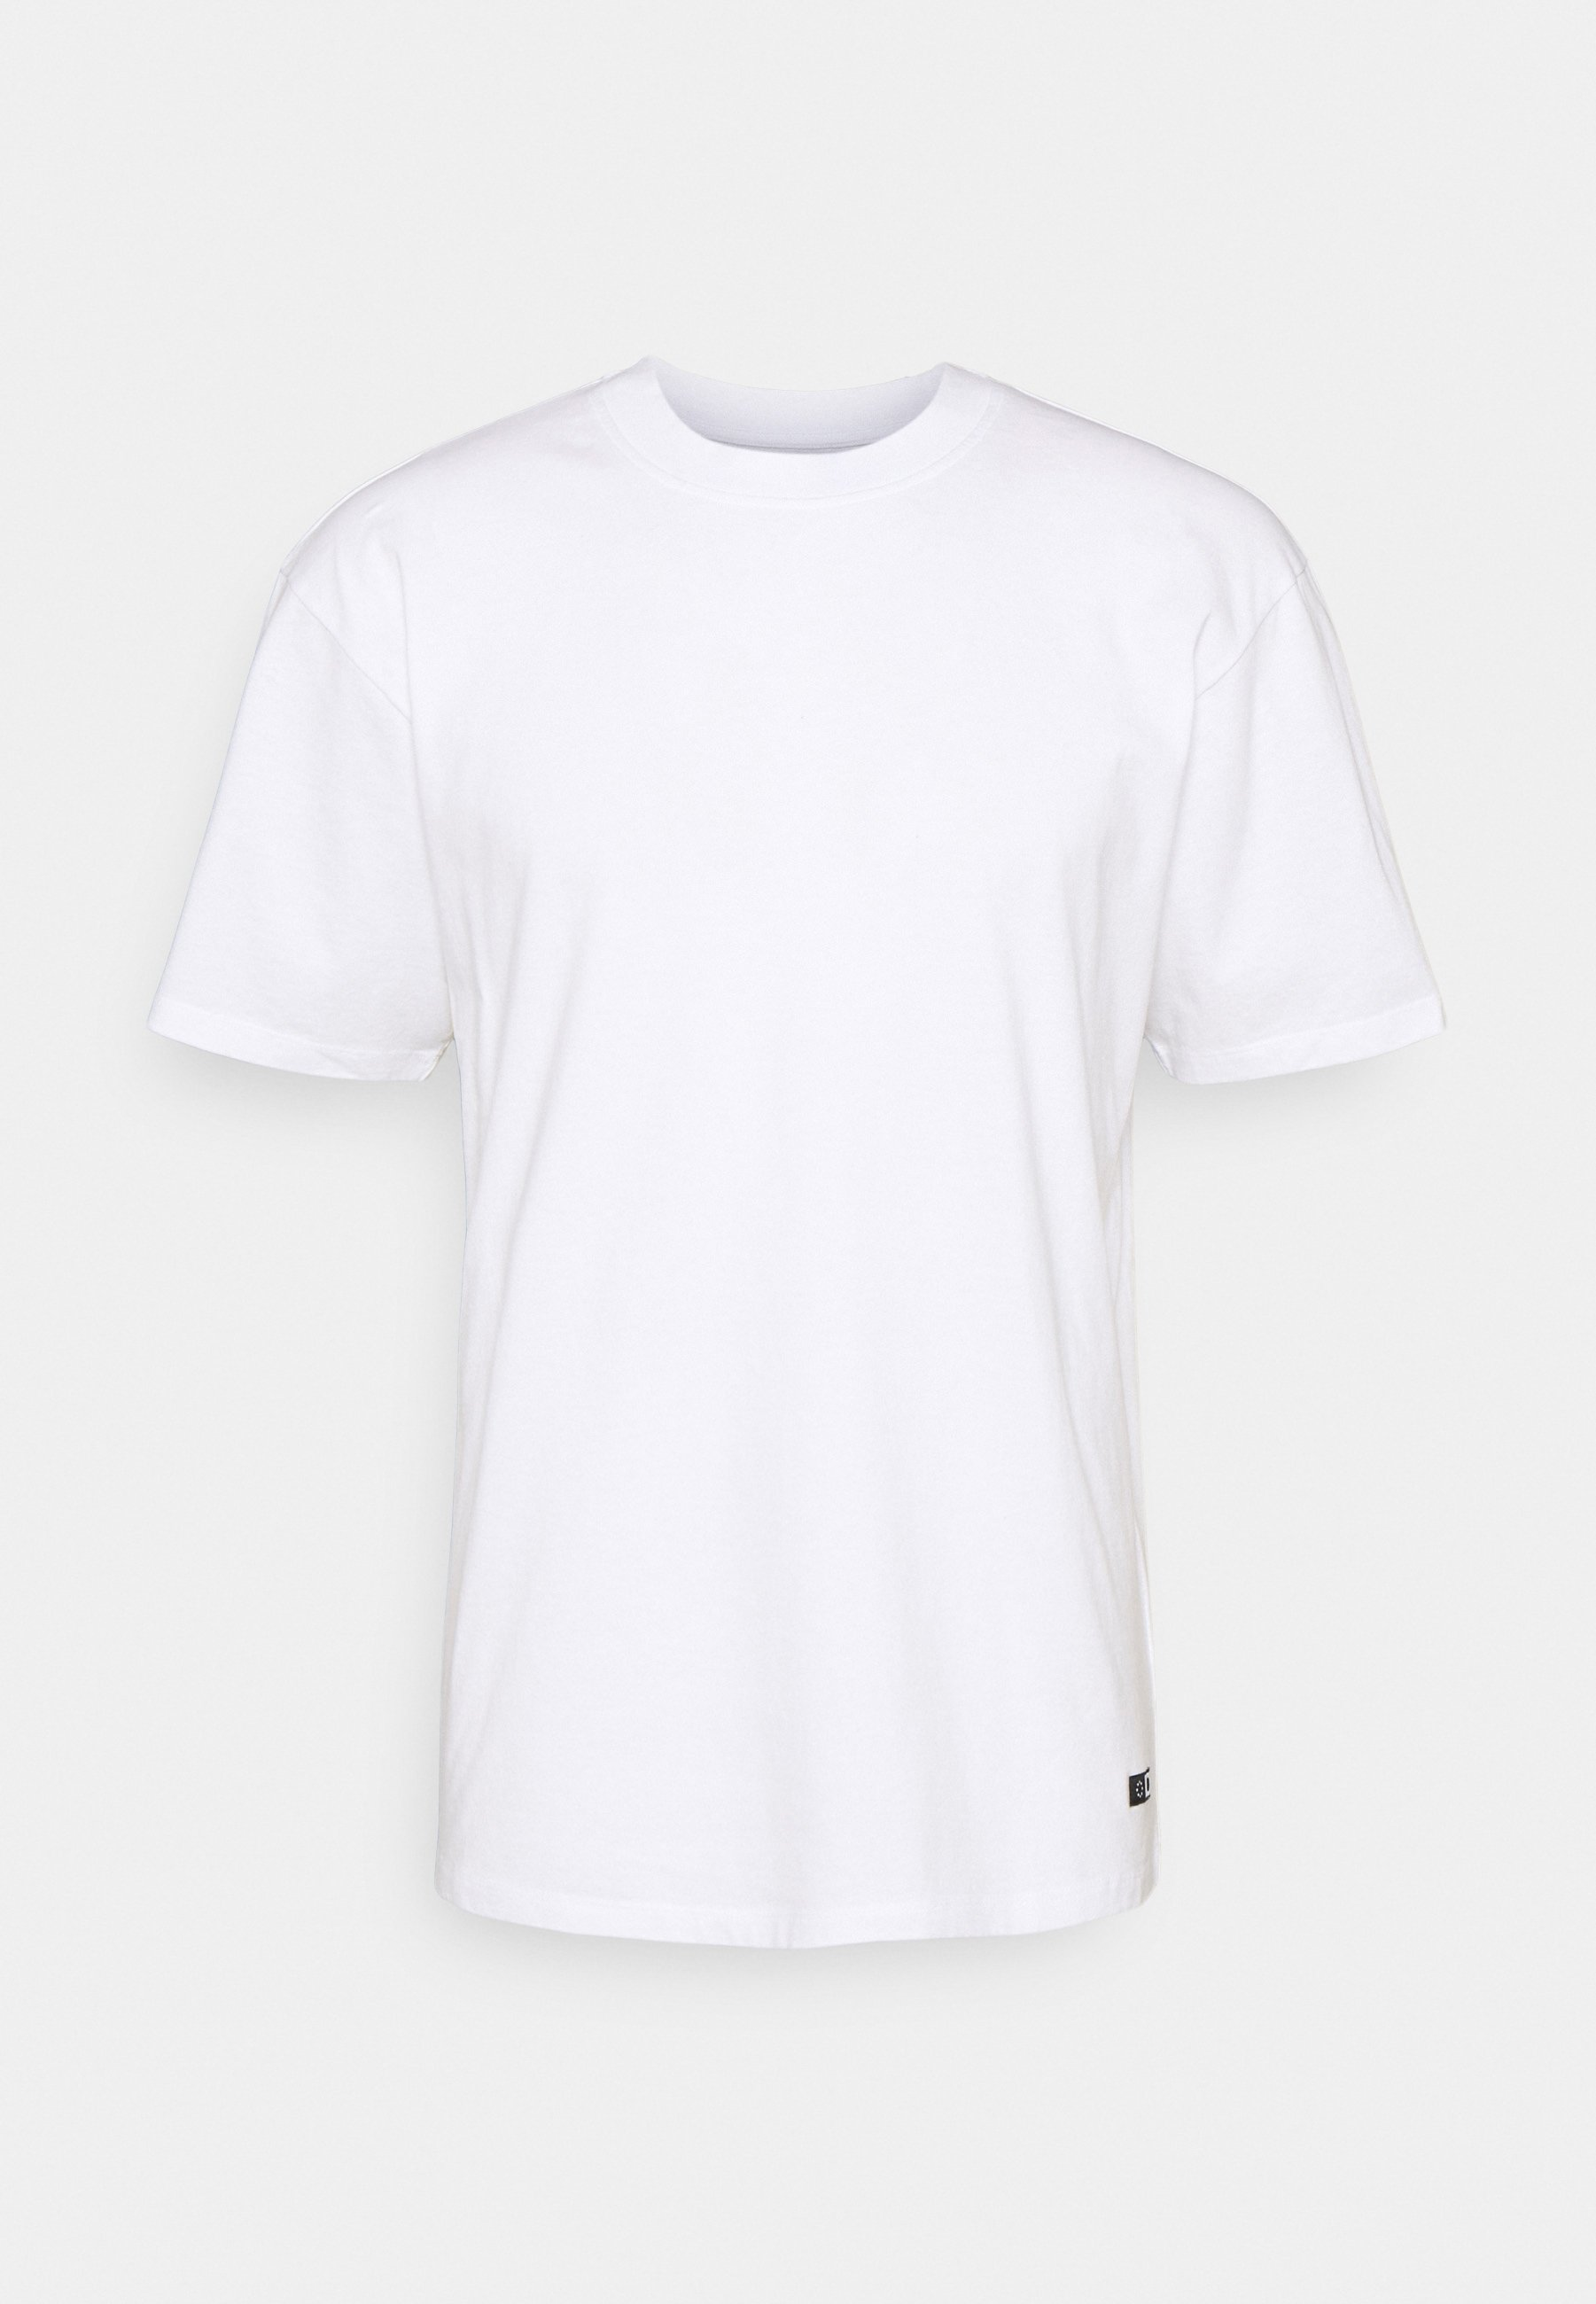 Homme OVERSIZE PLAIN SYNERGY - T-shirt basique